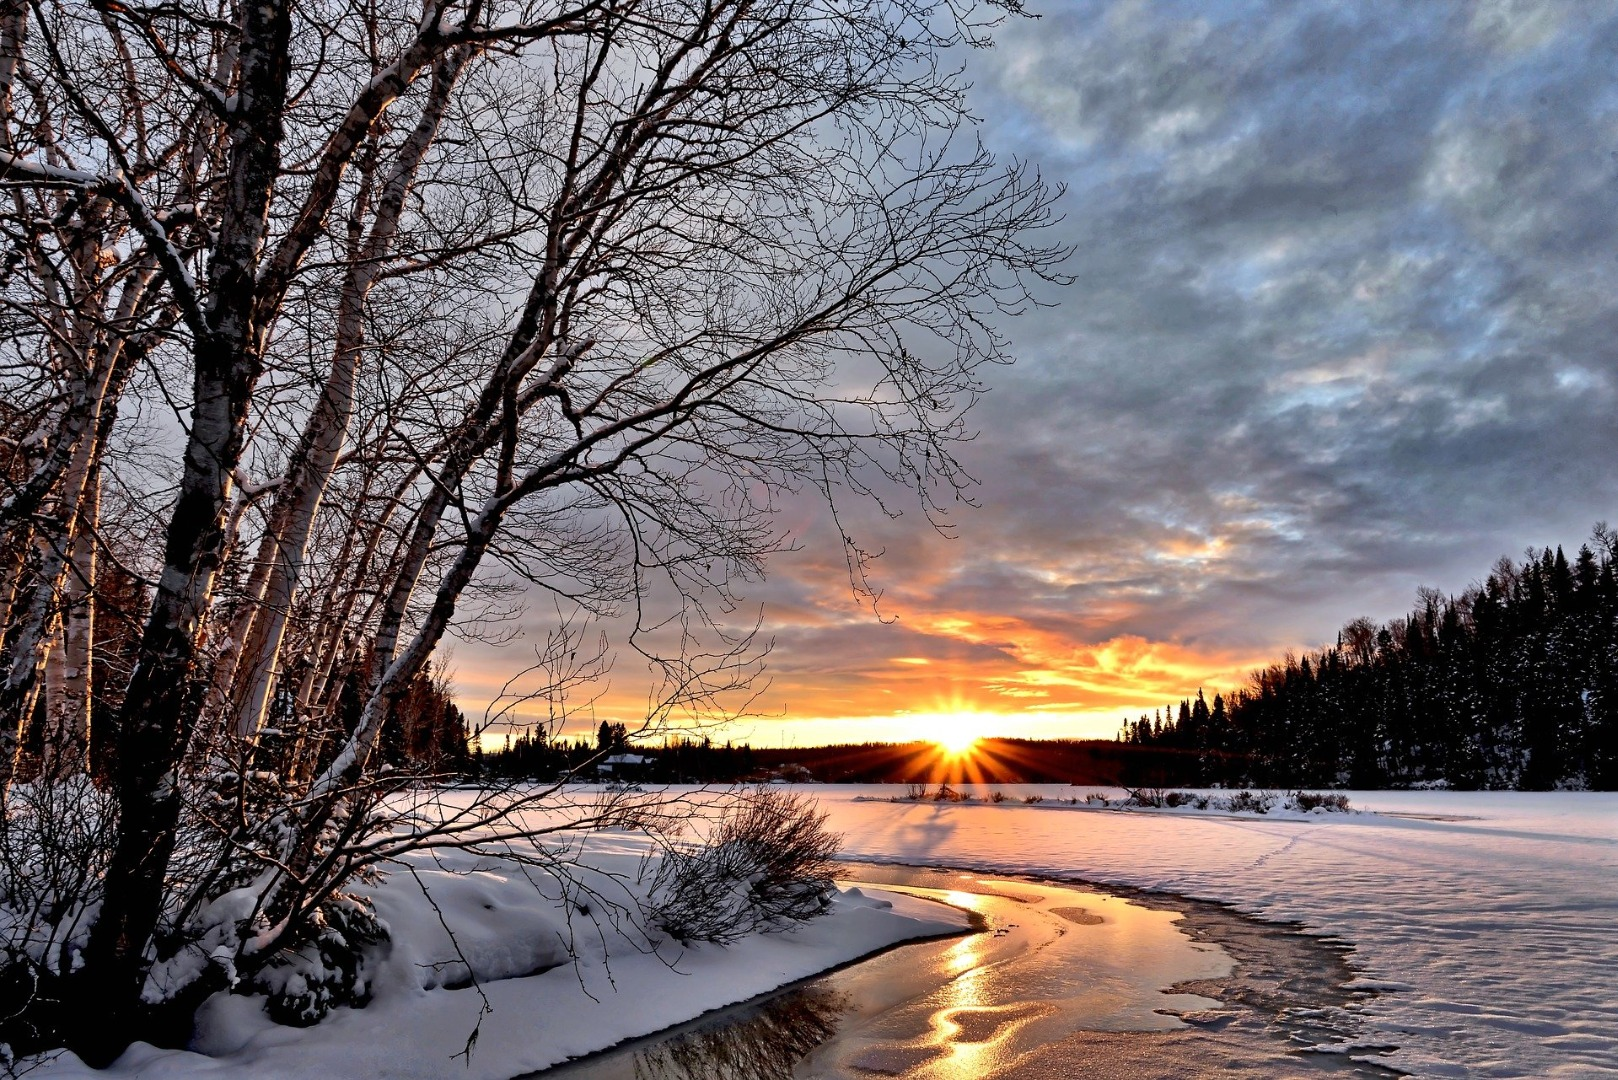 Winter landscape 2995987 1920